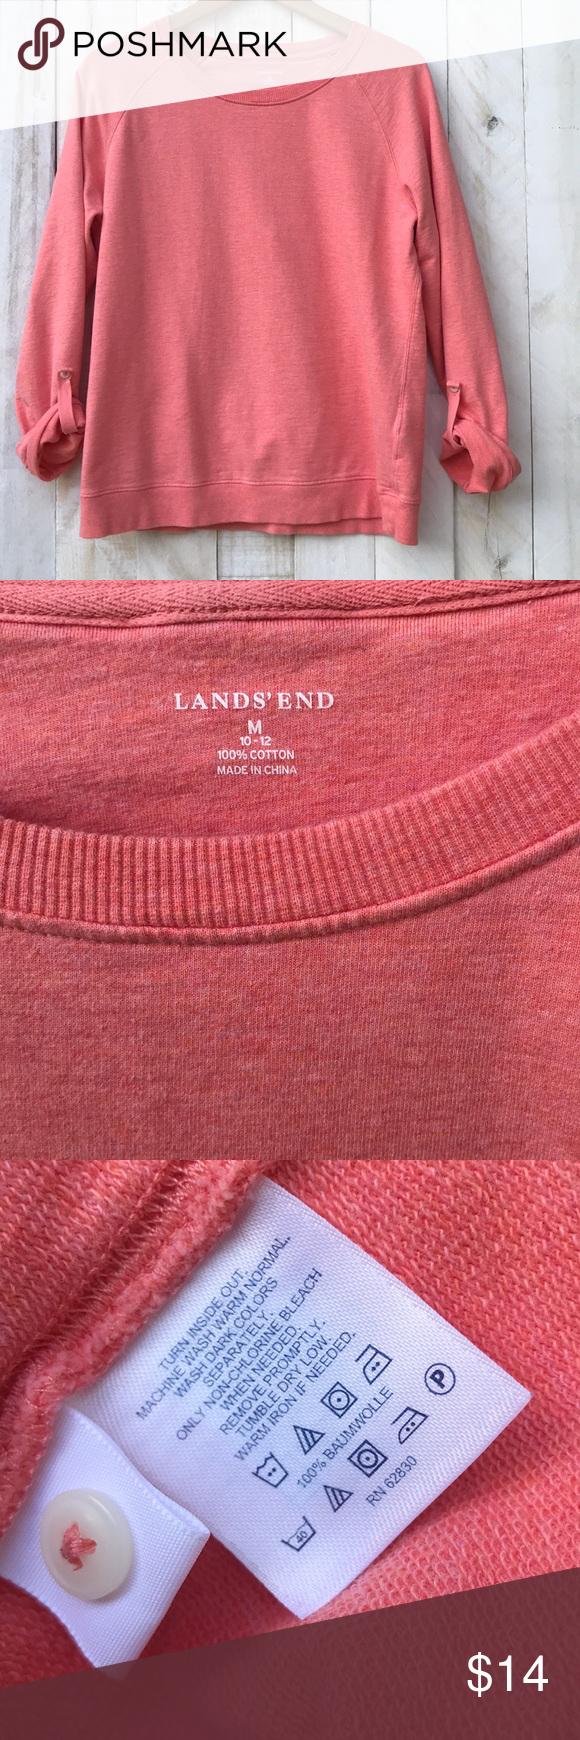 Lands End Sweatshirt Clothes Design Fashion Design Fashion Tips [ 1740 x 580 Pixel ]